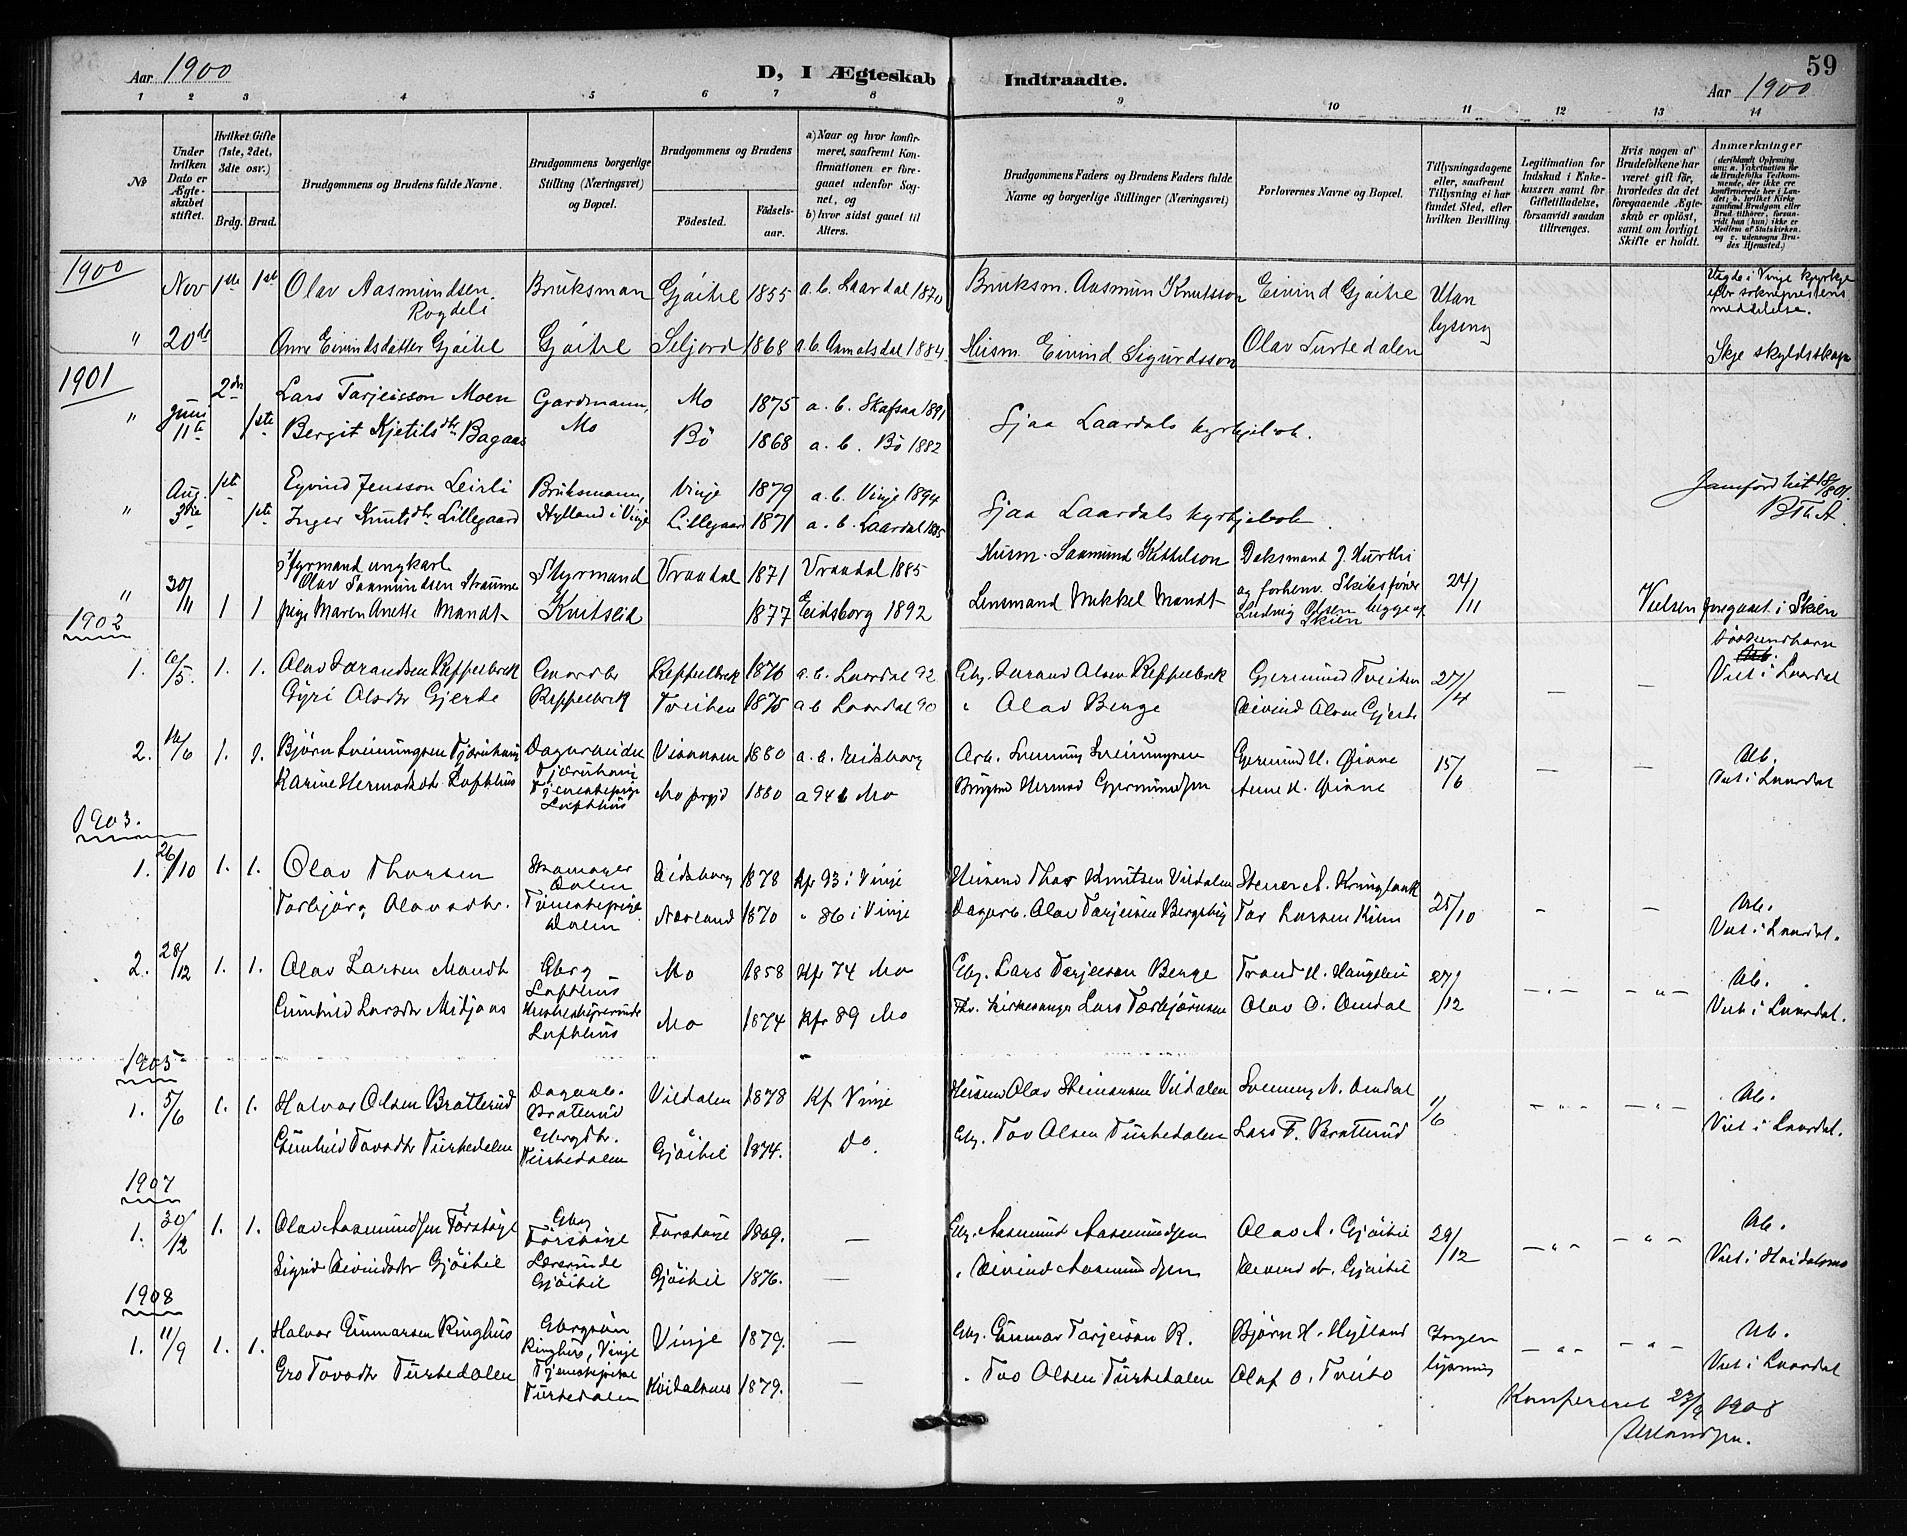 SAKO, Lårdal kirkebøker, G/Gb/L0003: Klokkerbok nr. II 3, 1889-1920, s. 59